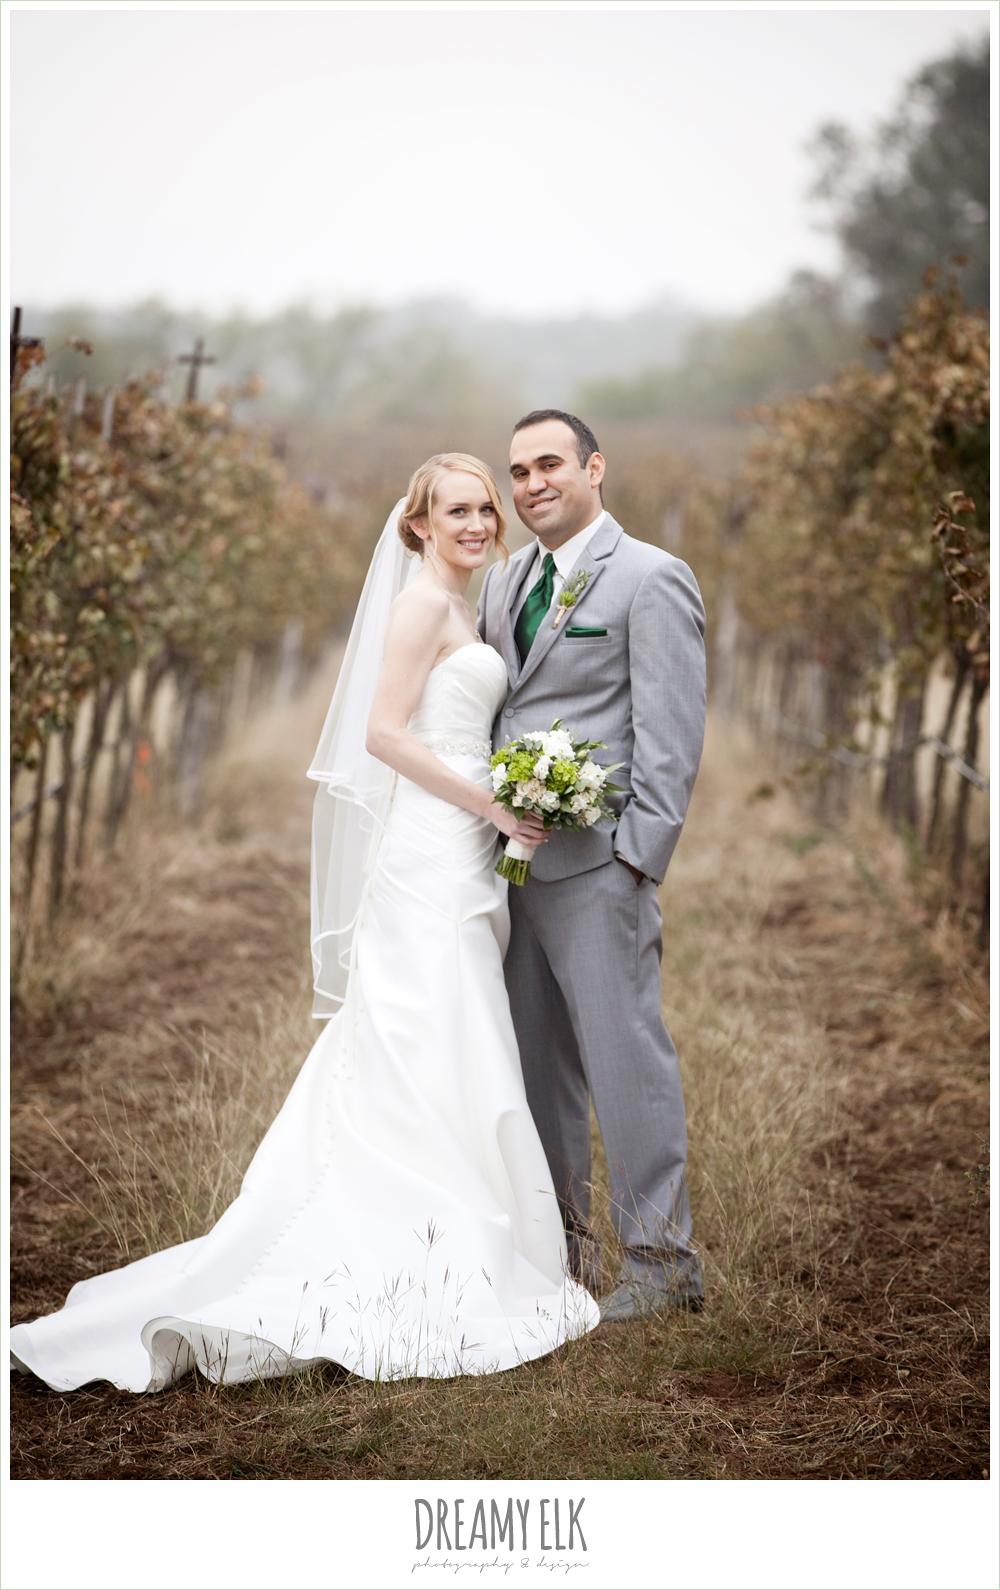 mallory & esteban, the wedding photo contest